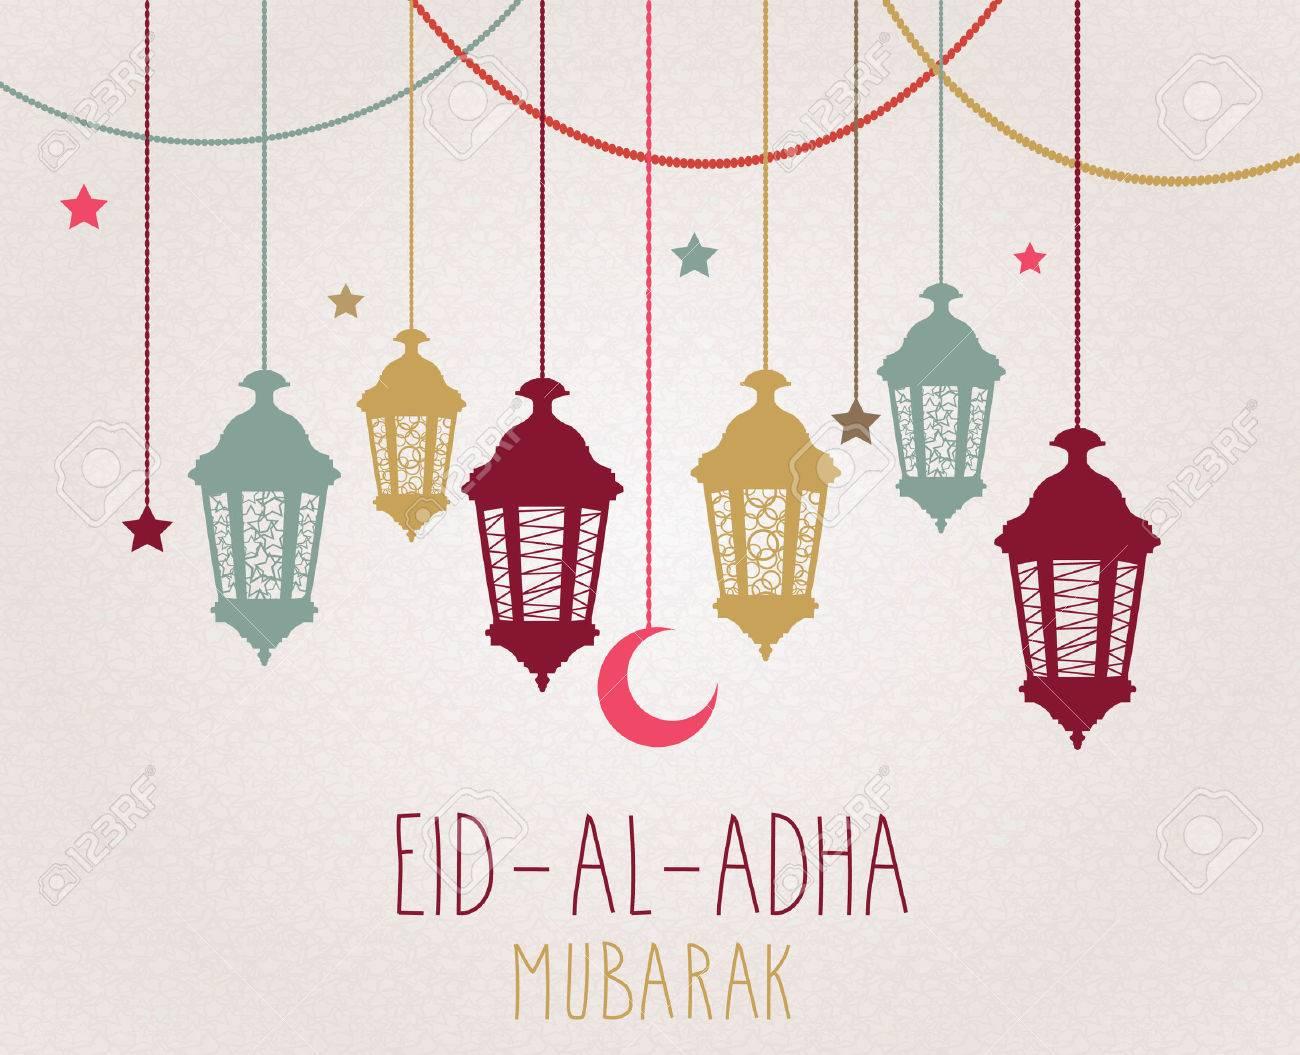 Popular Idul Fitri Eid Al-Fitr Decorations - 44386343-eid-al-adha-mubarak-poster-hanging-lantern-vector-illustration-  Snapshot_881624 .jpg